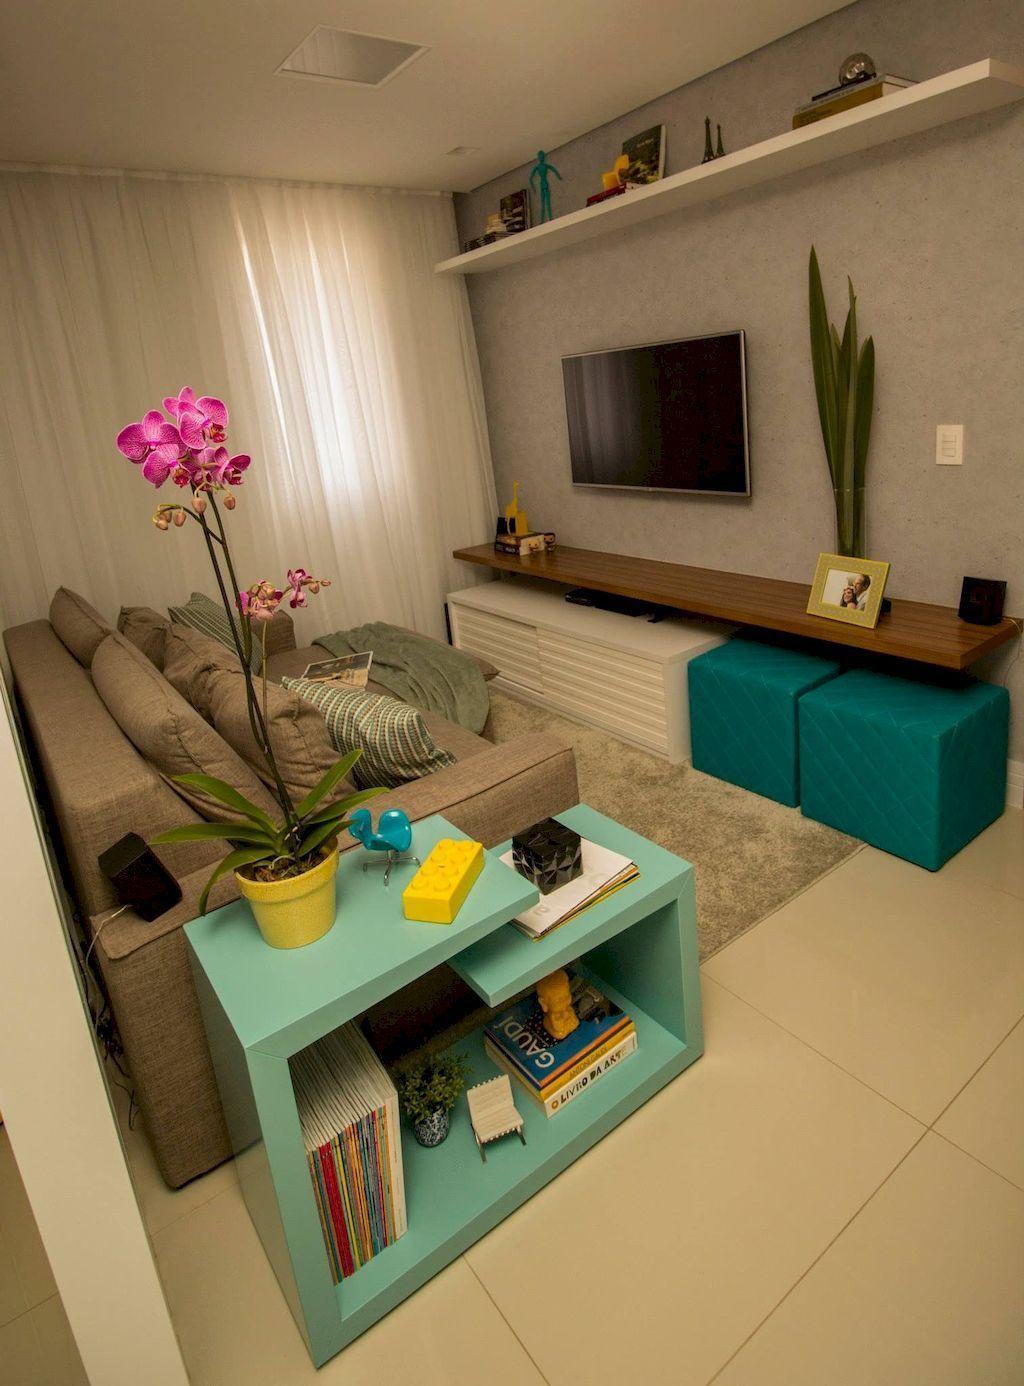 Inspiring Small Living Room Decor Ideas 13